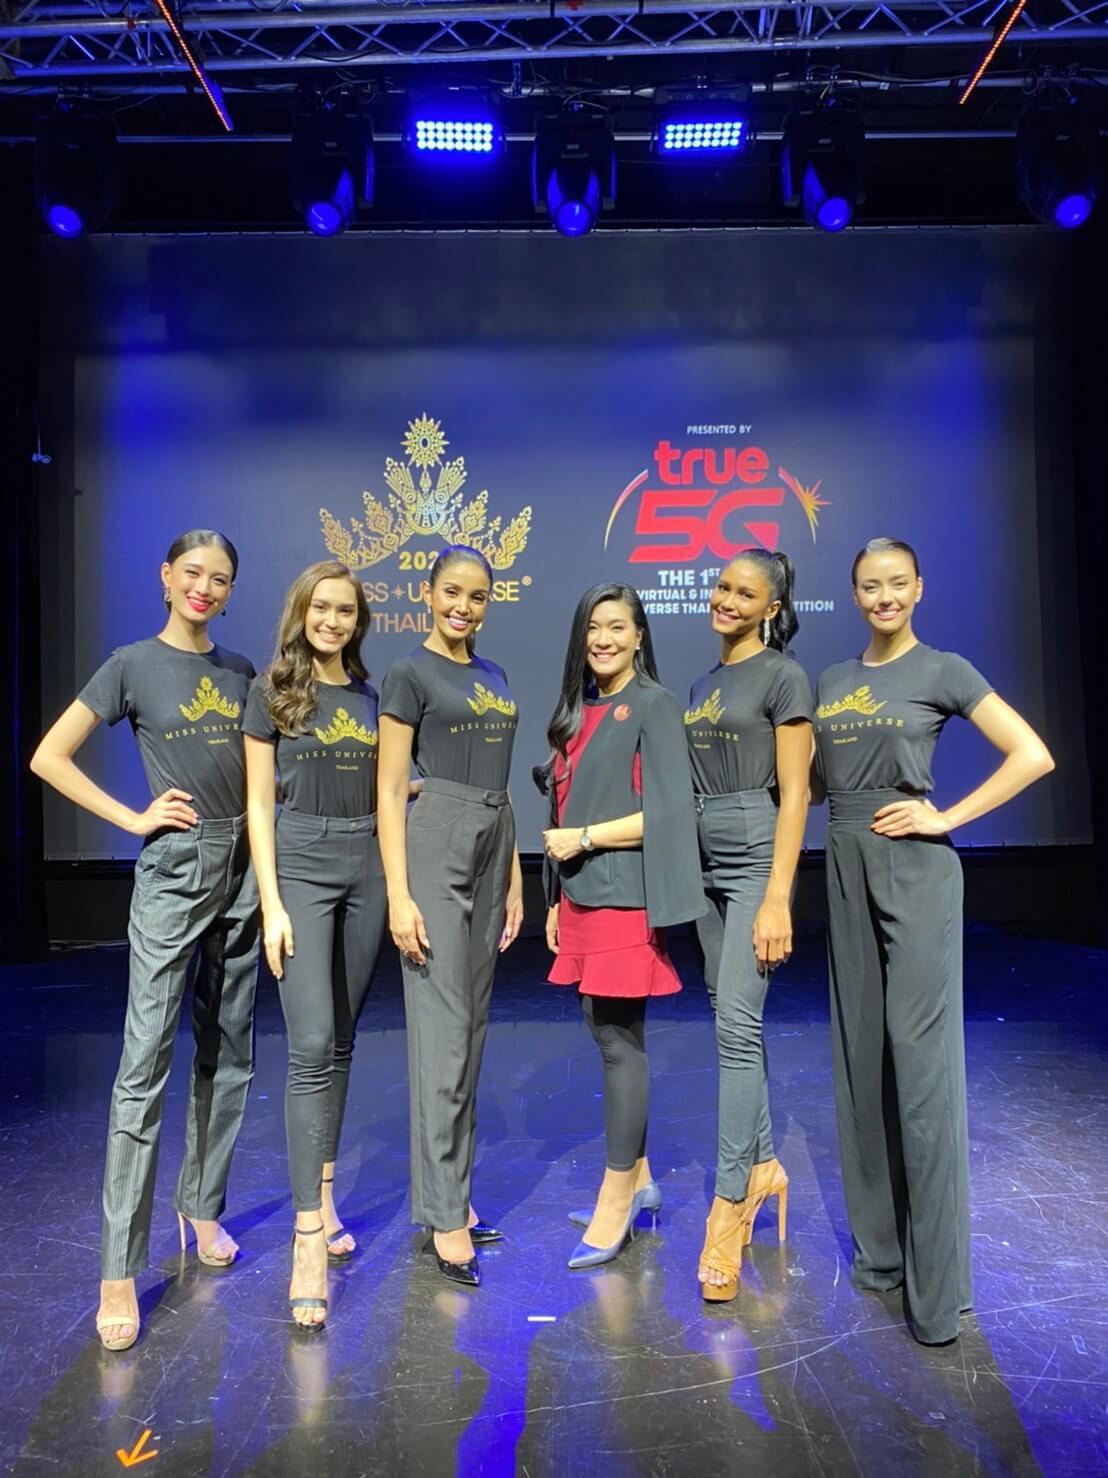 AssetWise ได้เข้าร่วมการคัดเลือกสาวงาม 50 คนสุดท้าย ในการประกวด Miss Universe Thailand 2020